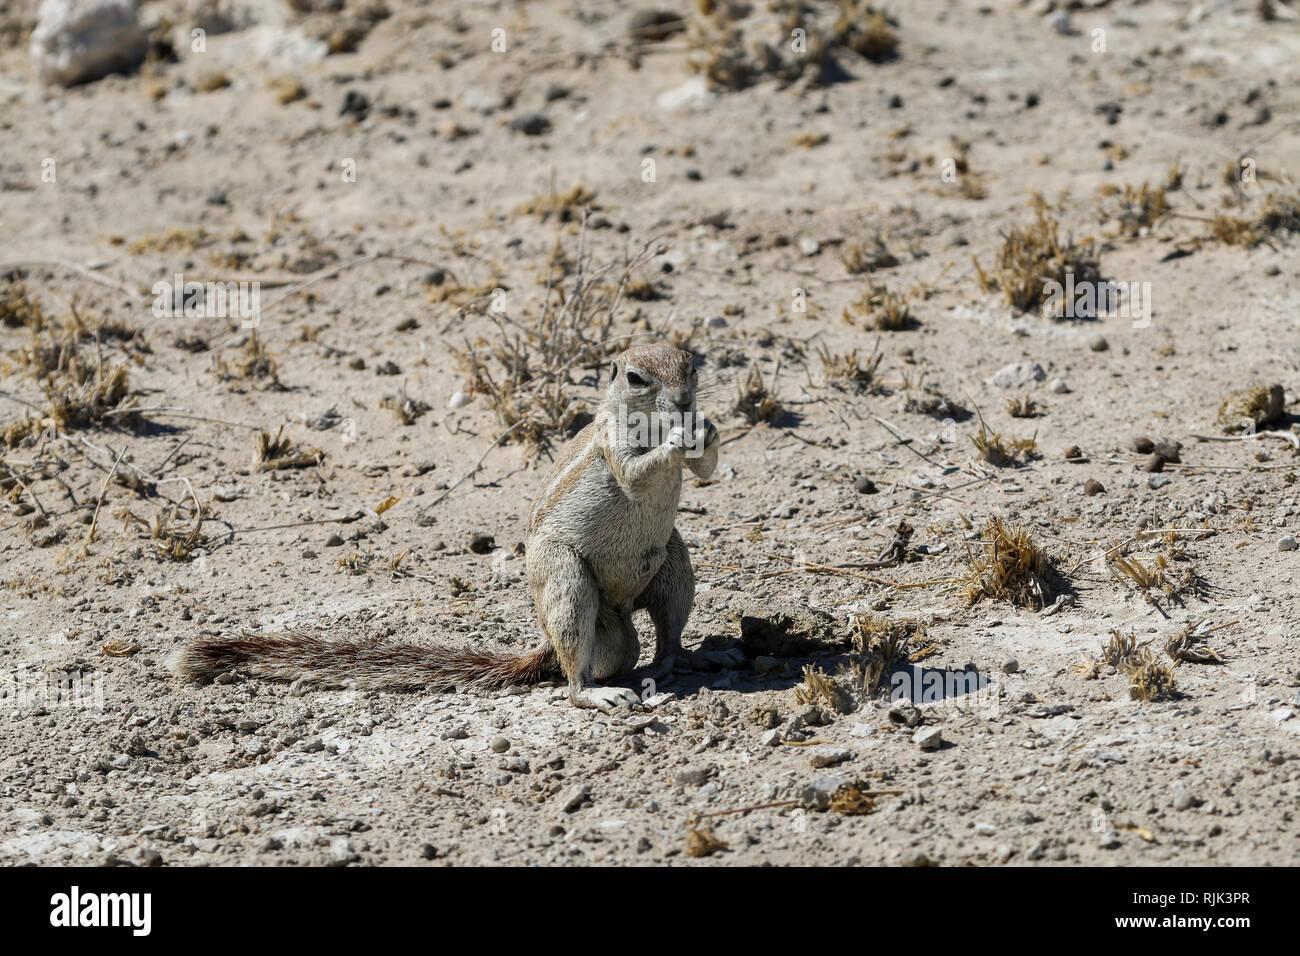 Streifenhörnchen in Namibia Stock Photo